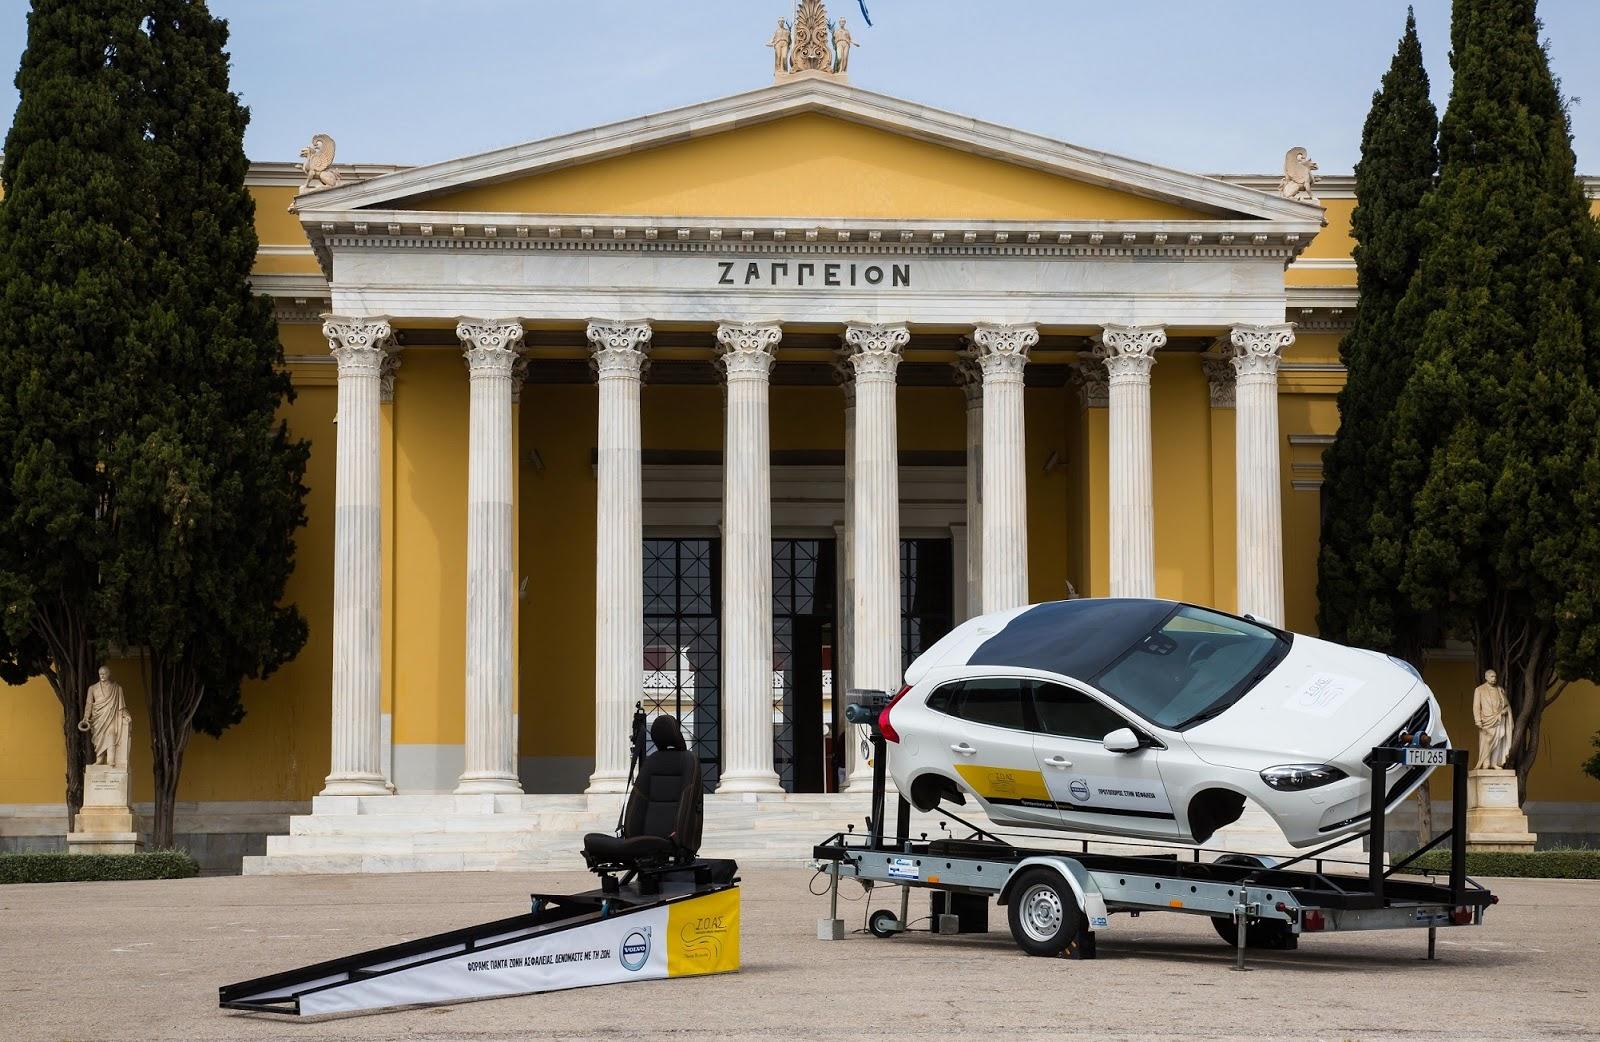 VOLVO2BKAI2BIOA25CE25A32B25CE25A325CE25A425CE259F2B25CE259625CE259125CE25A025CE25A025CE259525CE259925CE259F 2 Εβδομάδα κυκλοφοριακής αγωγής στο Ζάππειο με συμμετοχή της Volvo Volvo, Volvo Car Hellas, Volvo Cars, Ι.Ο.ΑΣ «Πάνος Μυλωνάς», οδηγοί